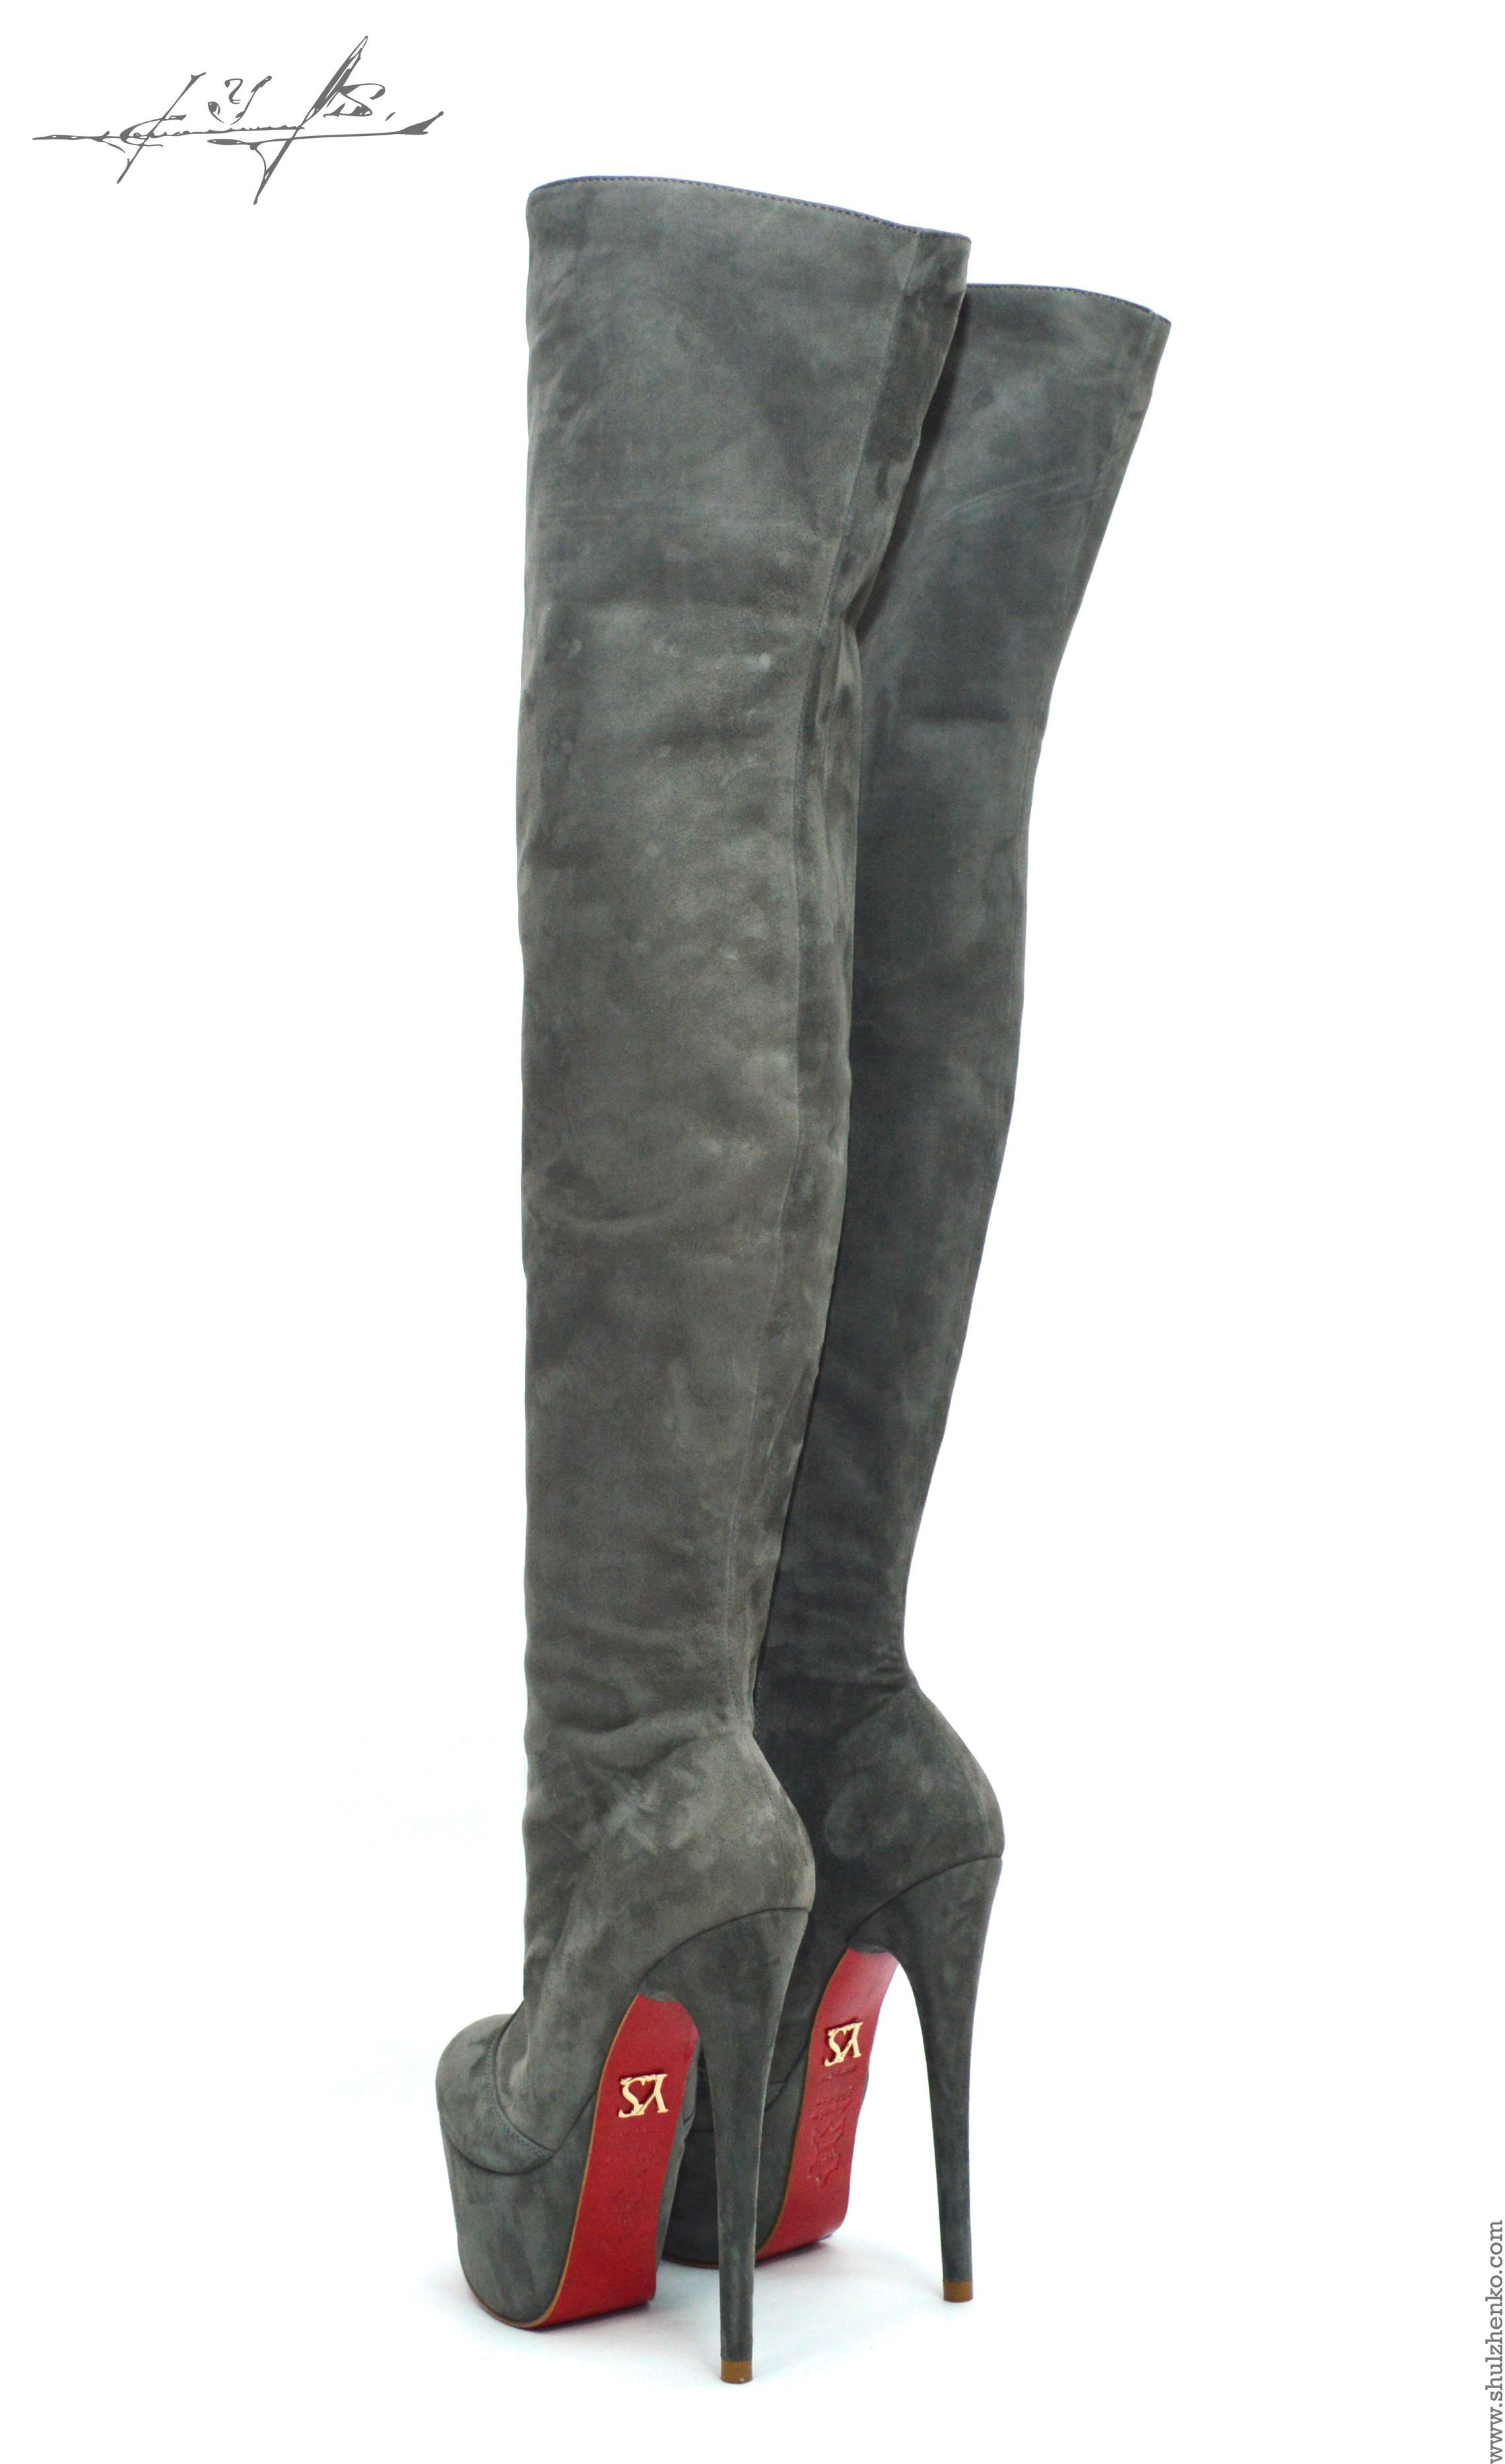 adidas ultra stivali stability scarpe